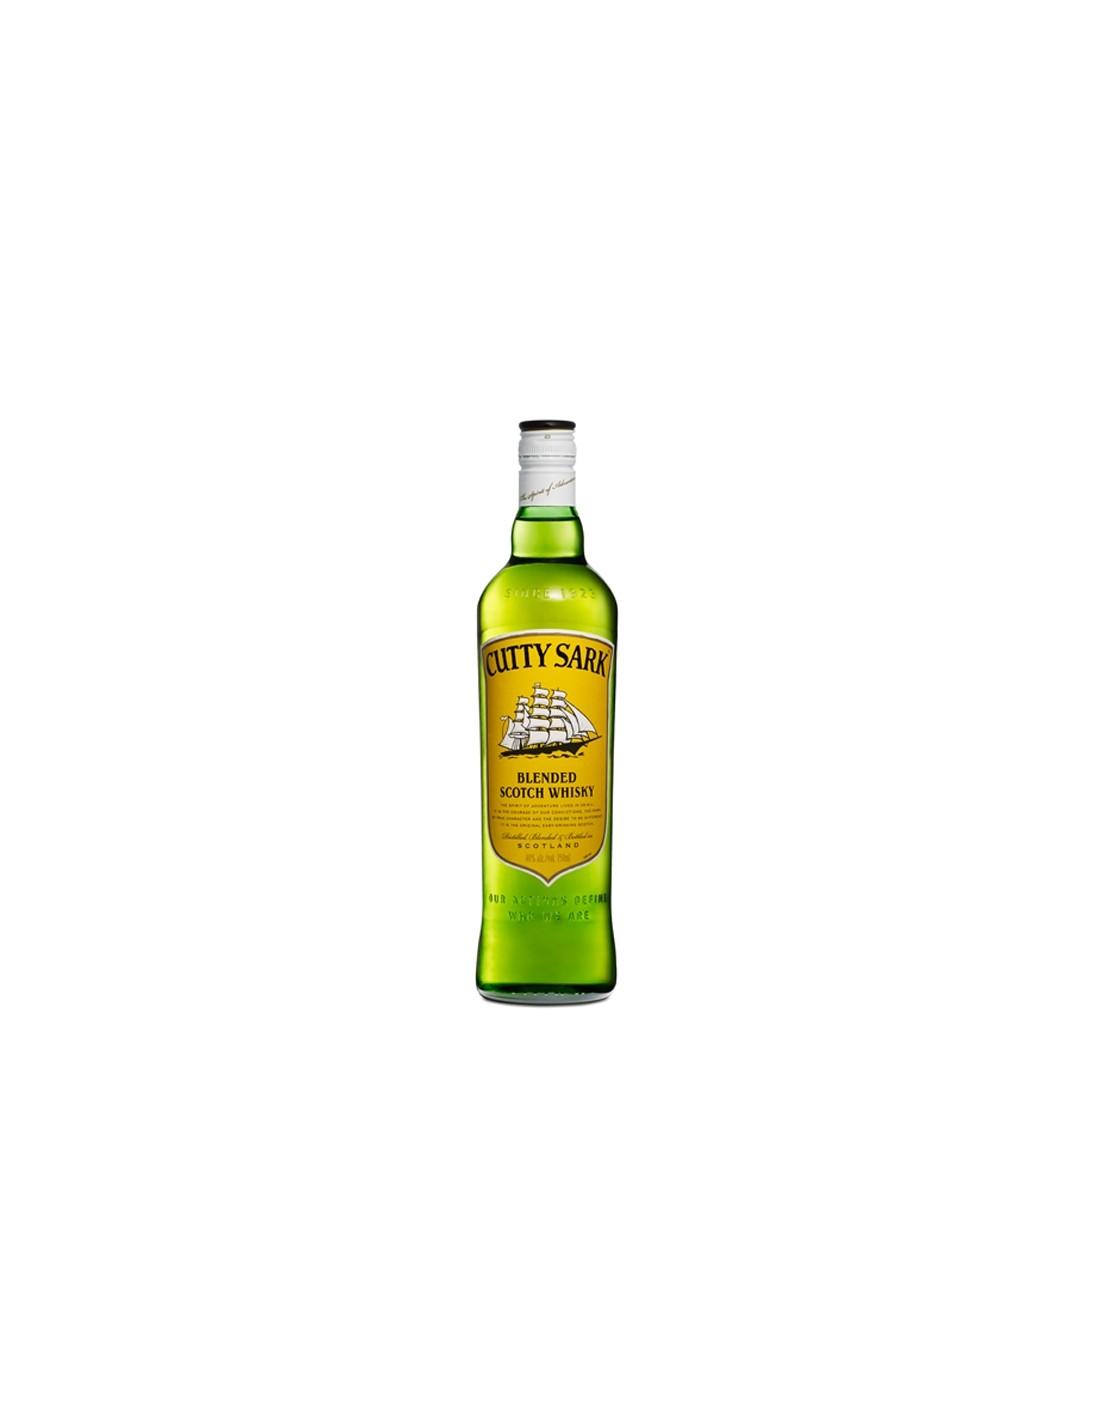 Whisky Cutty Sark, 40% alc., 0.7L, Scotia